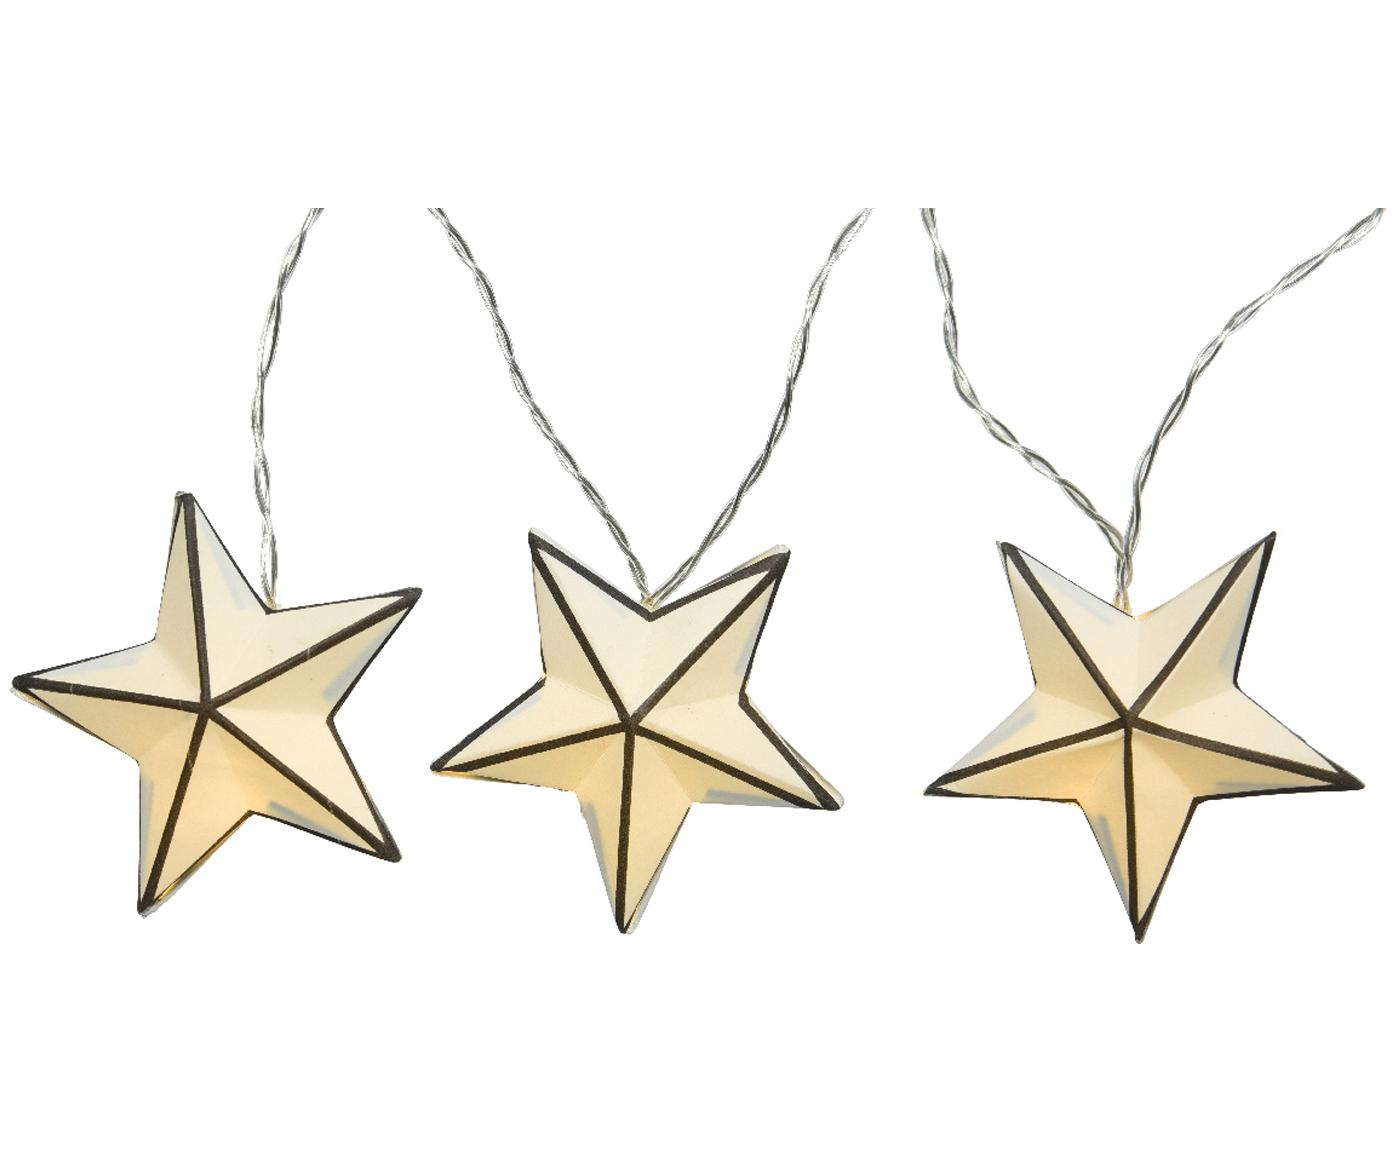 LED lichtslinger Stars, Wit, zwart, L 380 cm